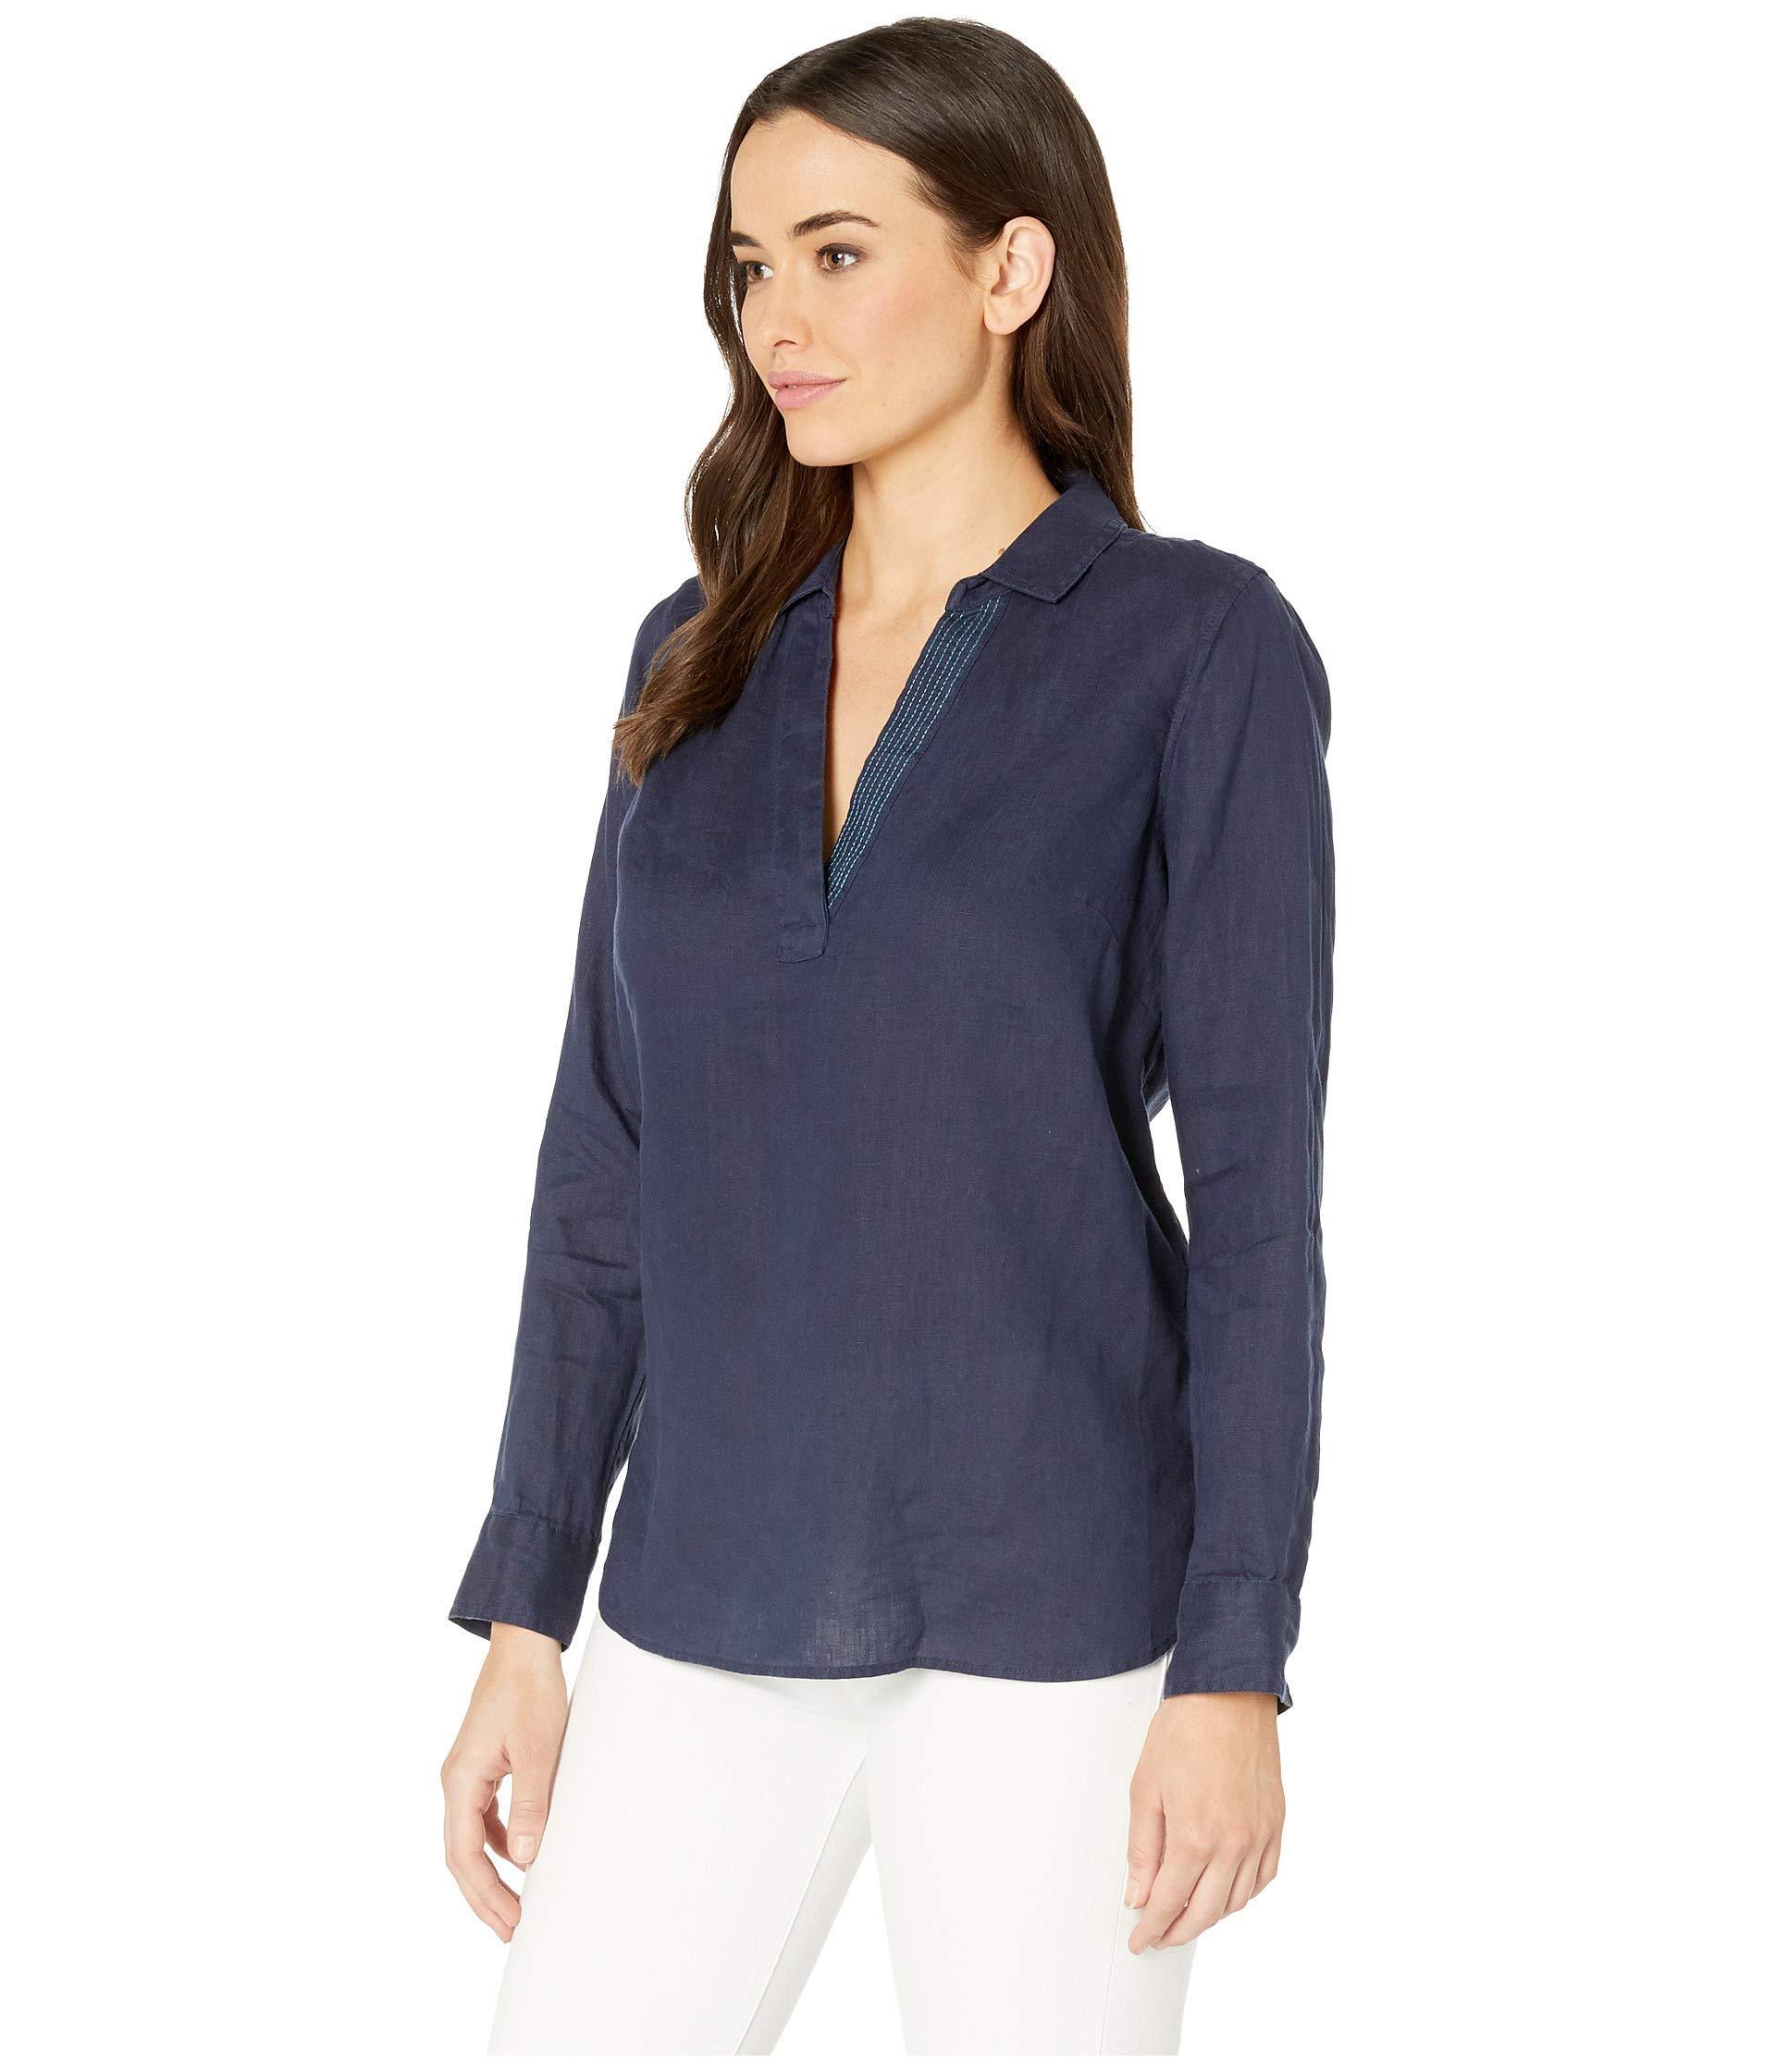 963c70eb8740b Lyst - NYDJ Linen Popover Tunic (optic White) Women s Clothing in Blue